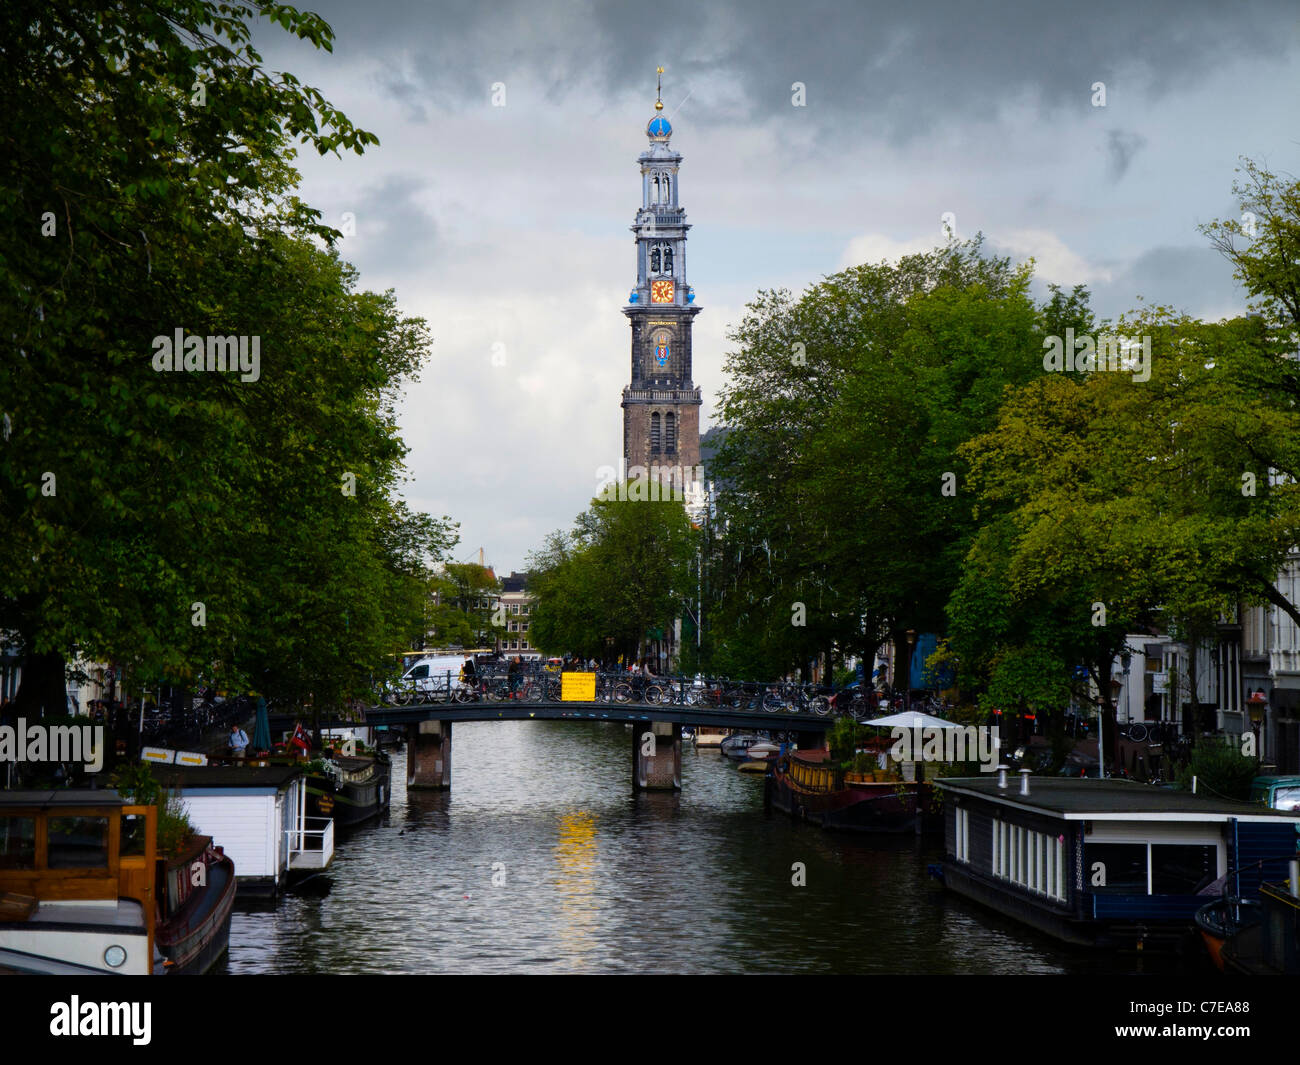 Westerkerk seen from the Prinsengracht. - Stock Image